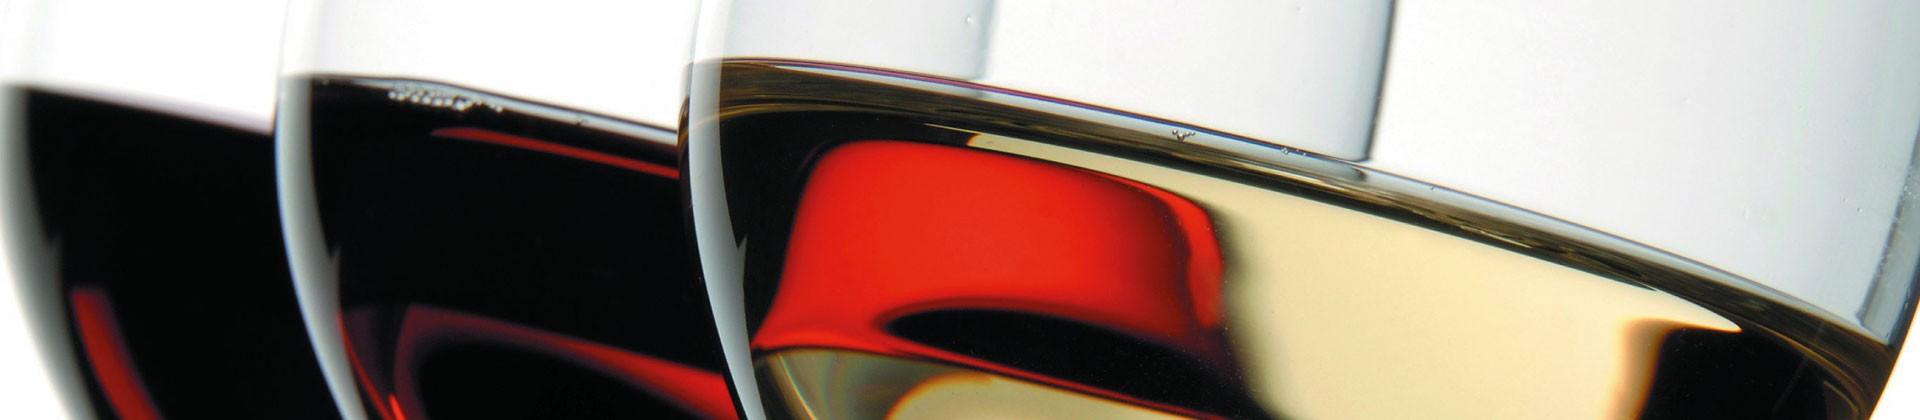 https://www.goodmorningtenerife.com/wp-content/uploads/2014/08/01_slide_wine_GM_Tenerife-1920x420.jpg